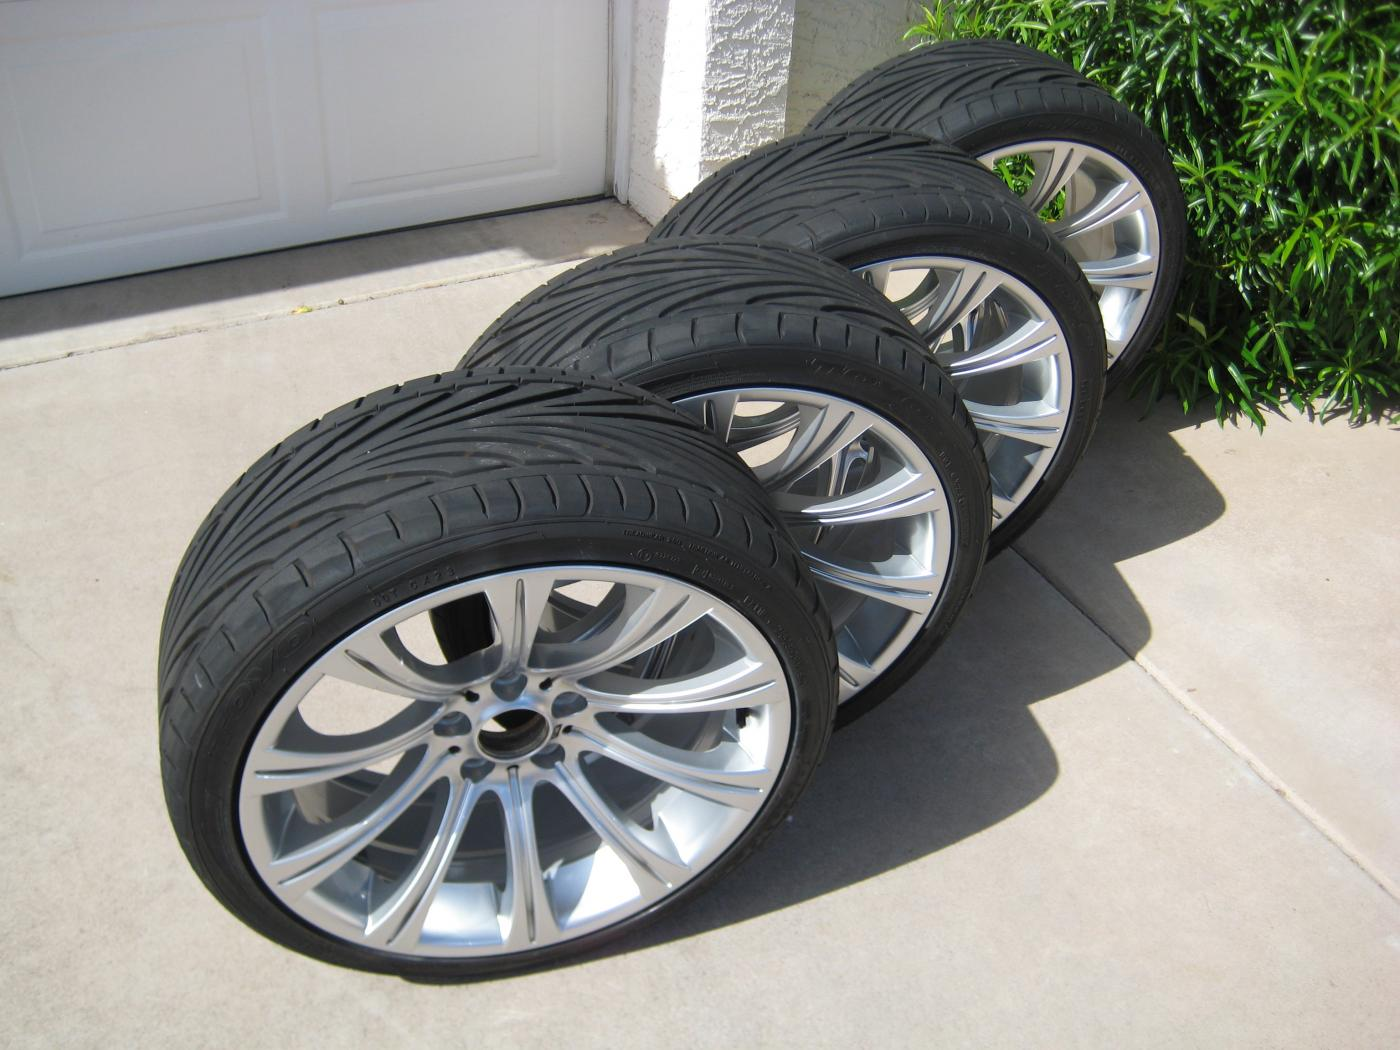 M5 E60 Bmw 166m Oem Alloy Wheels Toyo Tires